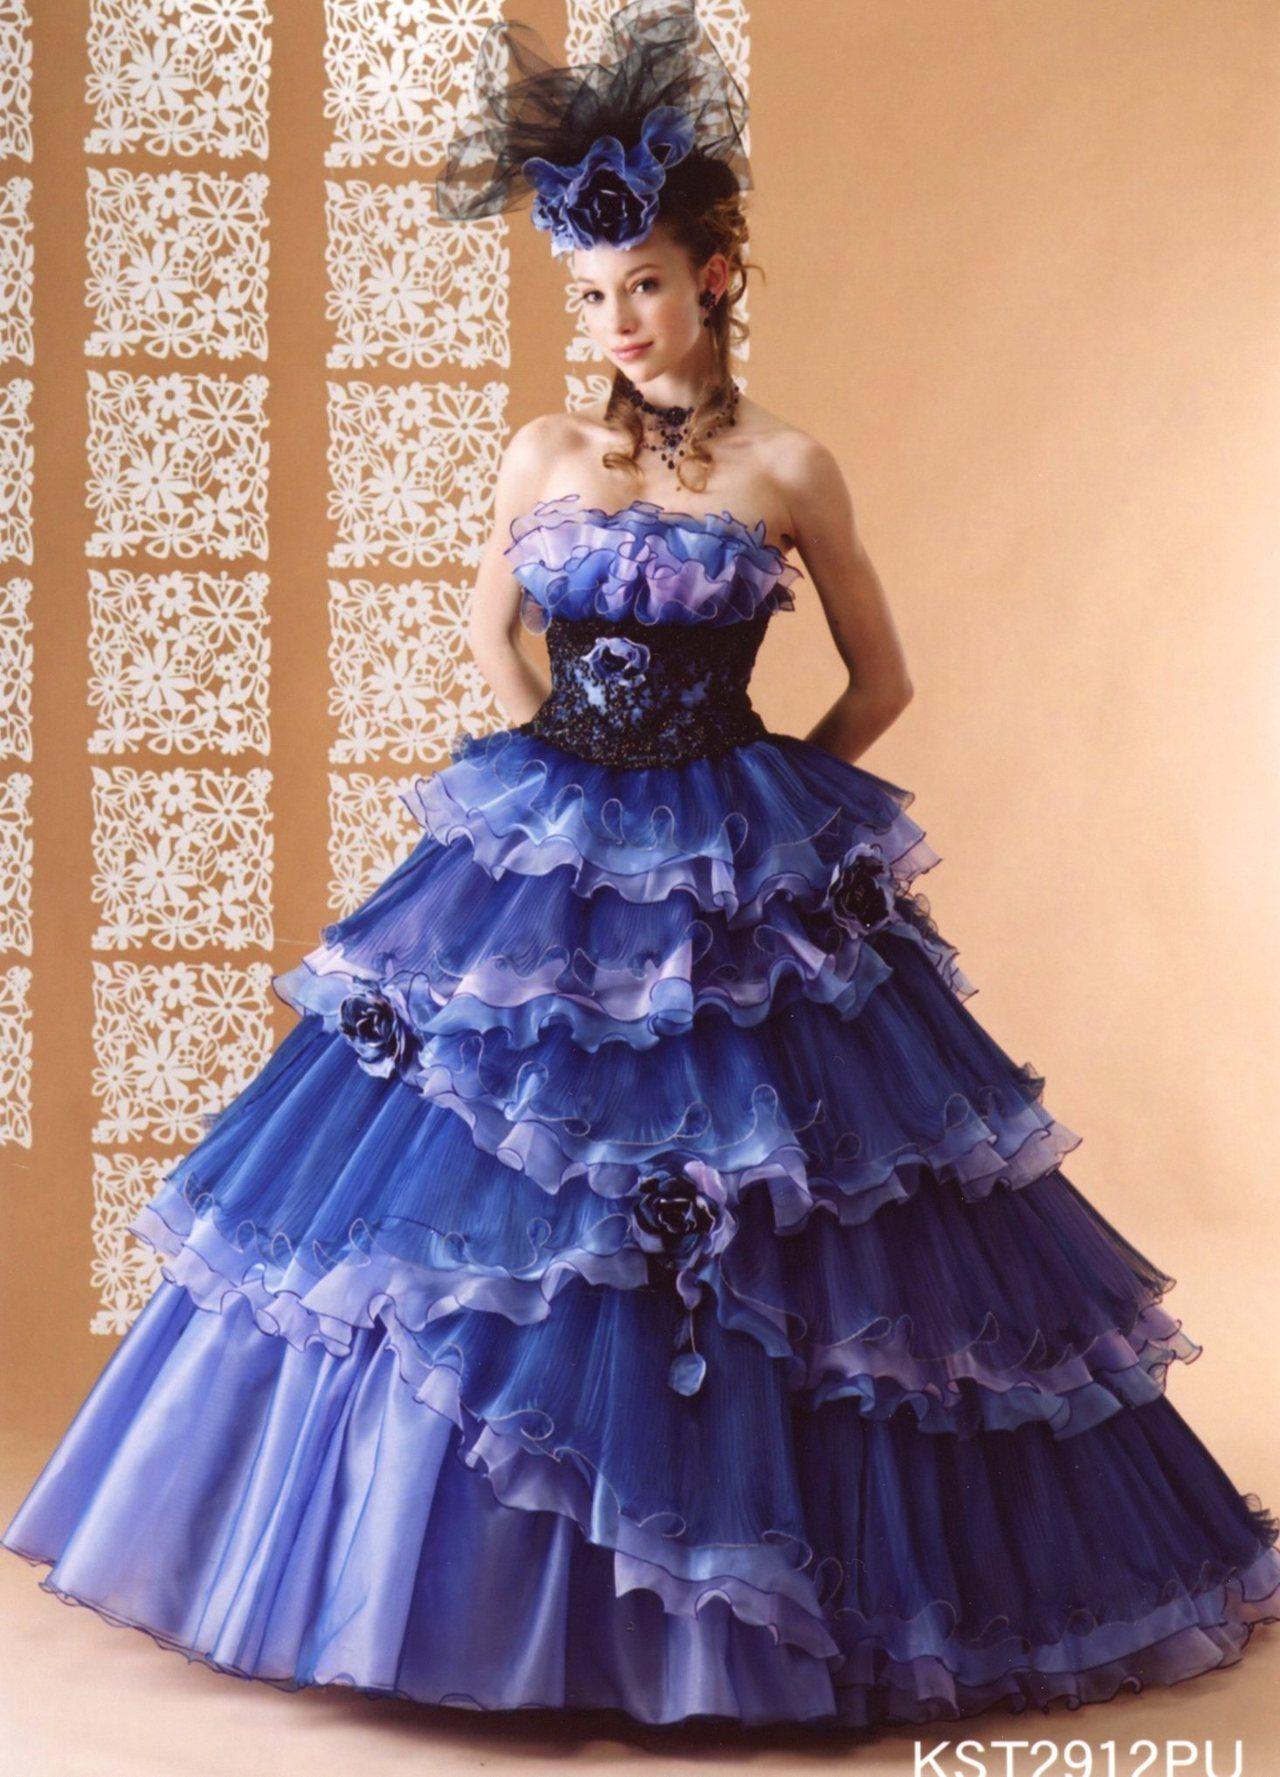 dball ~ dress ballgown | ガーリー・ボリュームドレス ブルー・ネイビー ...